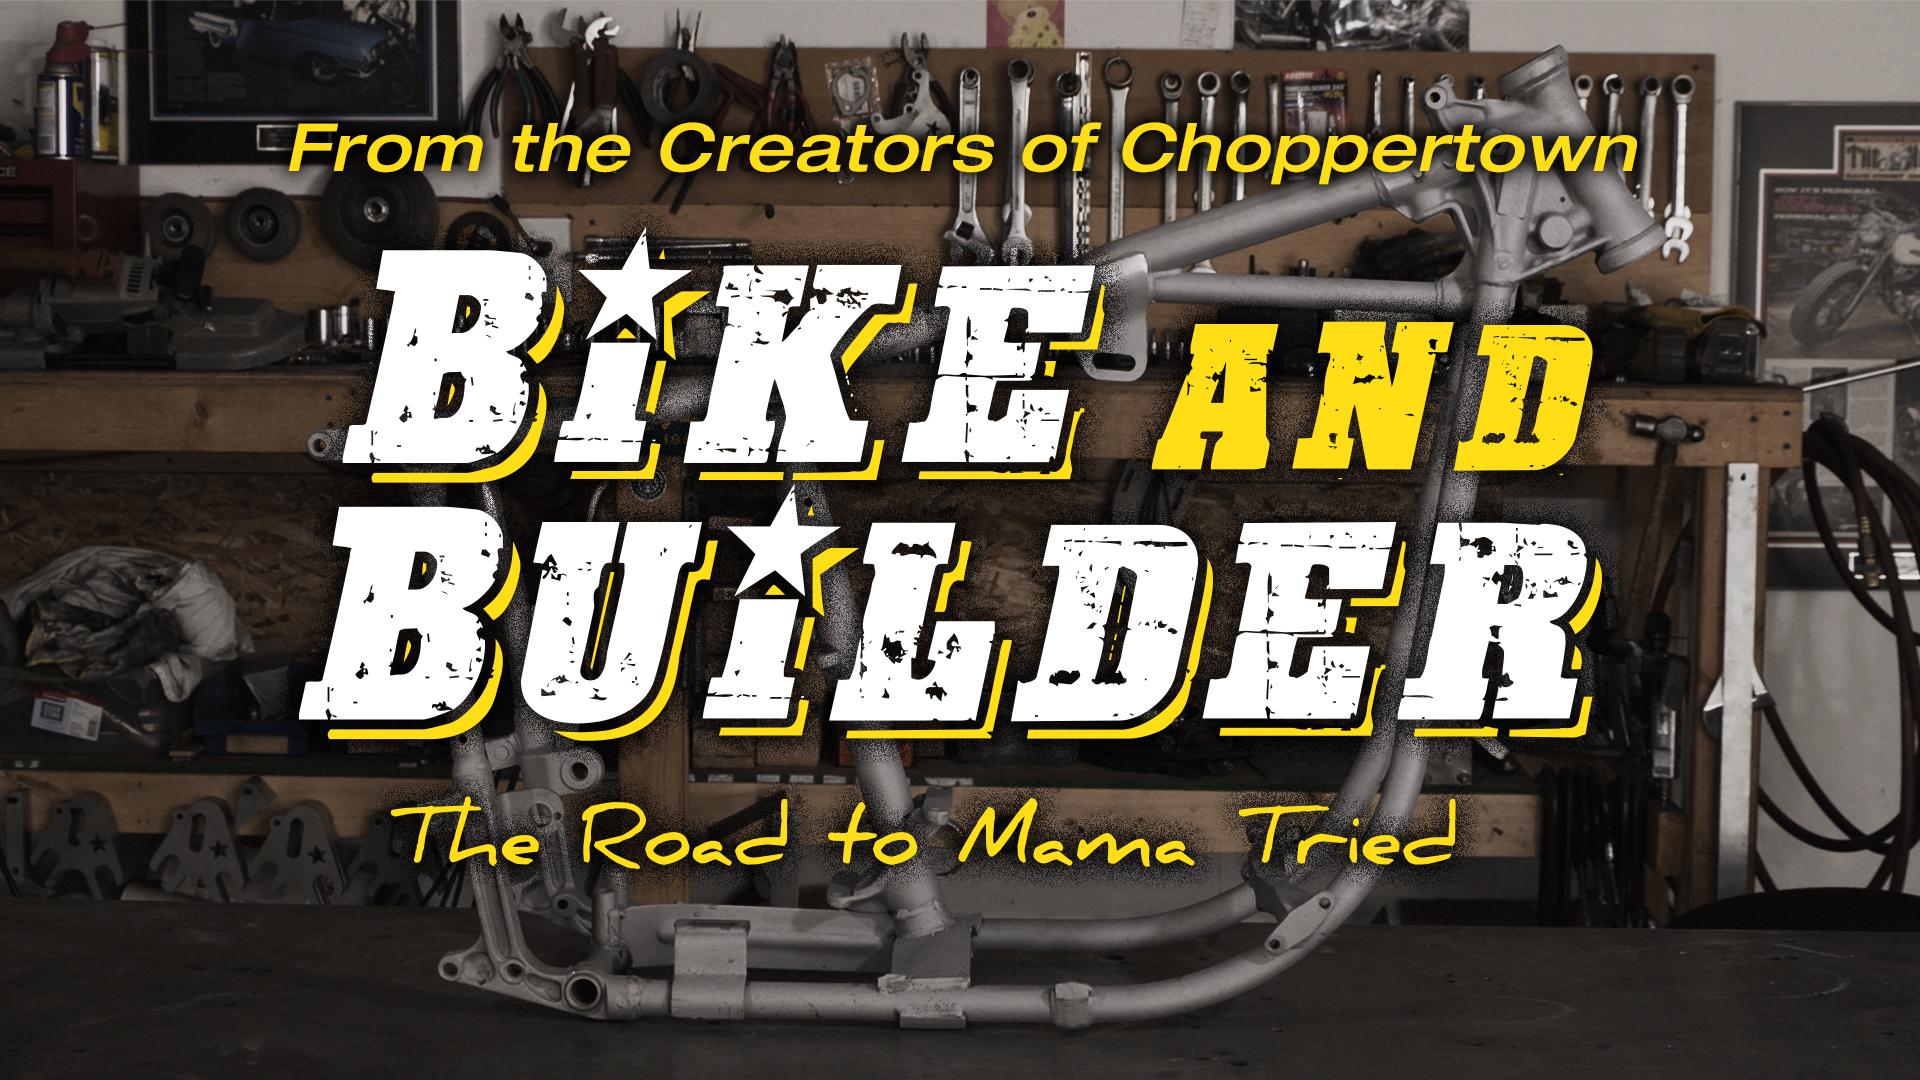 bike-n-builder-ka-1920x1080-v6.jpg